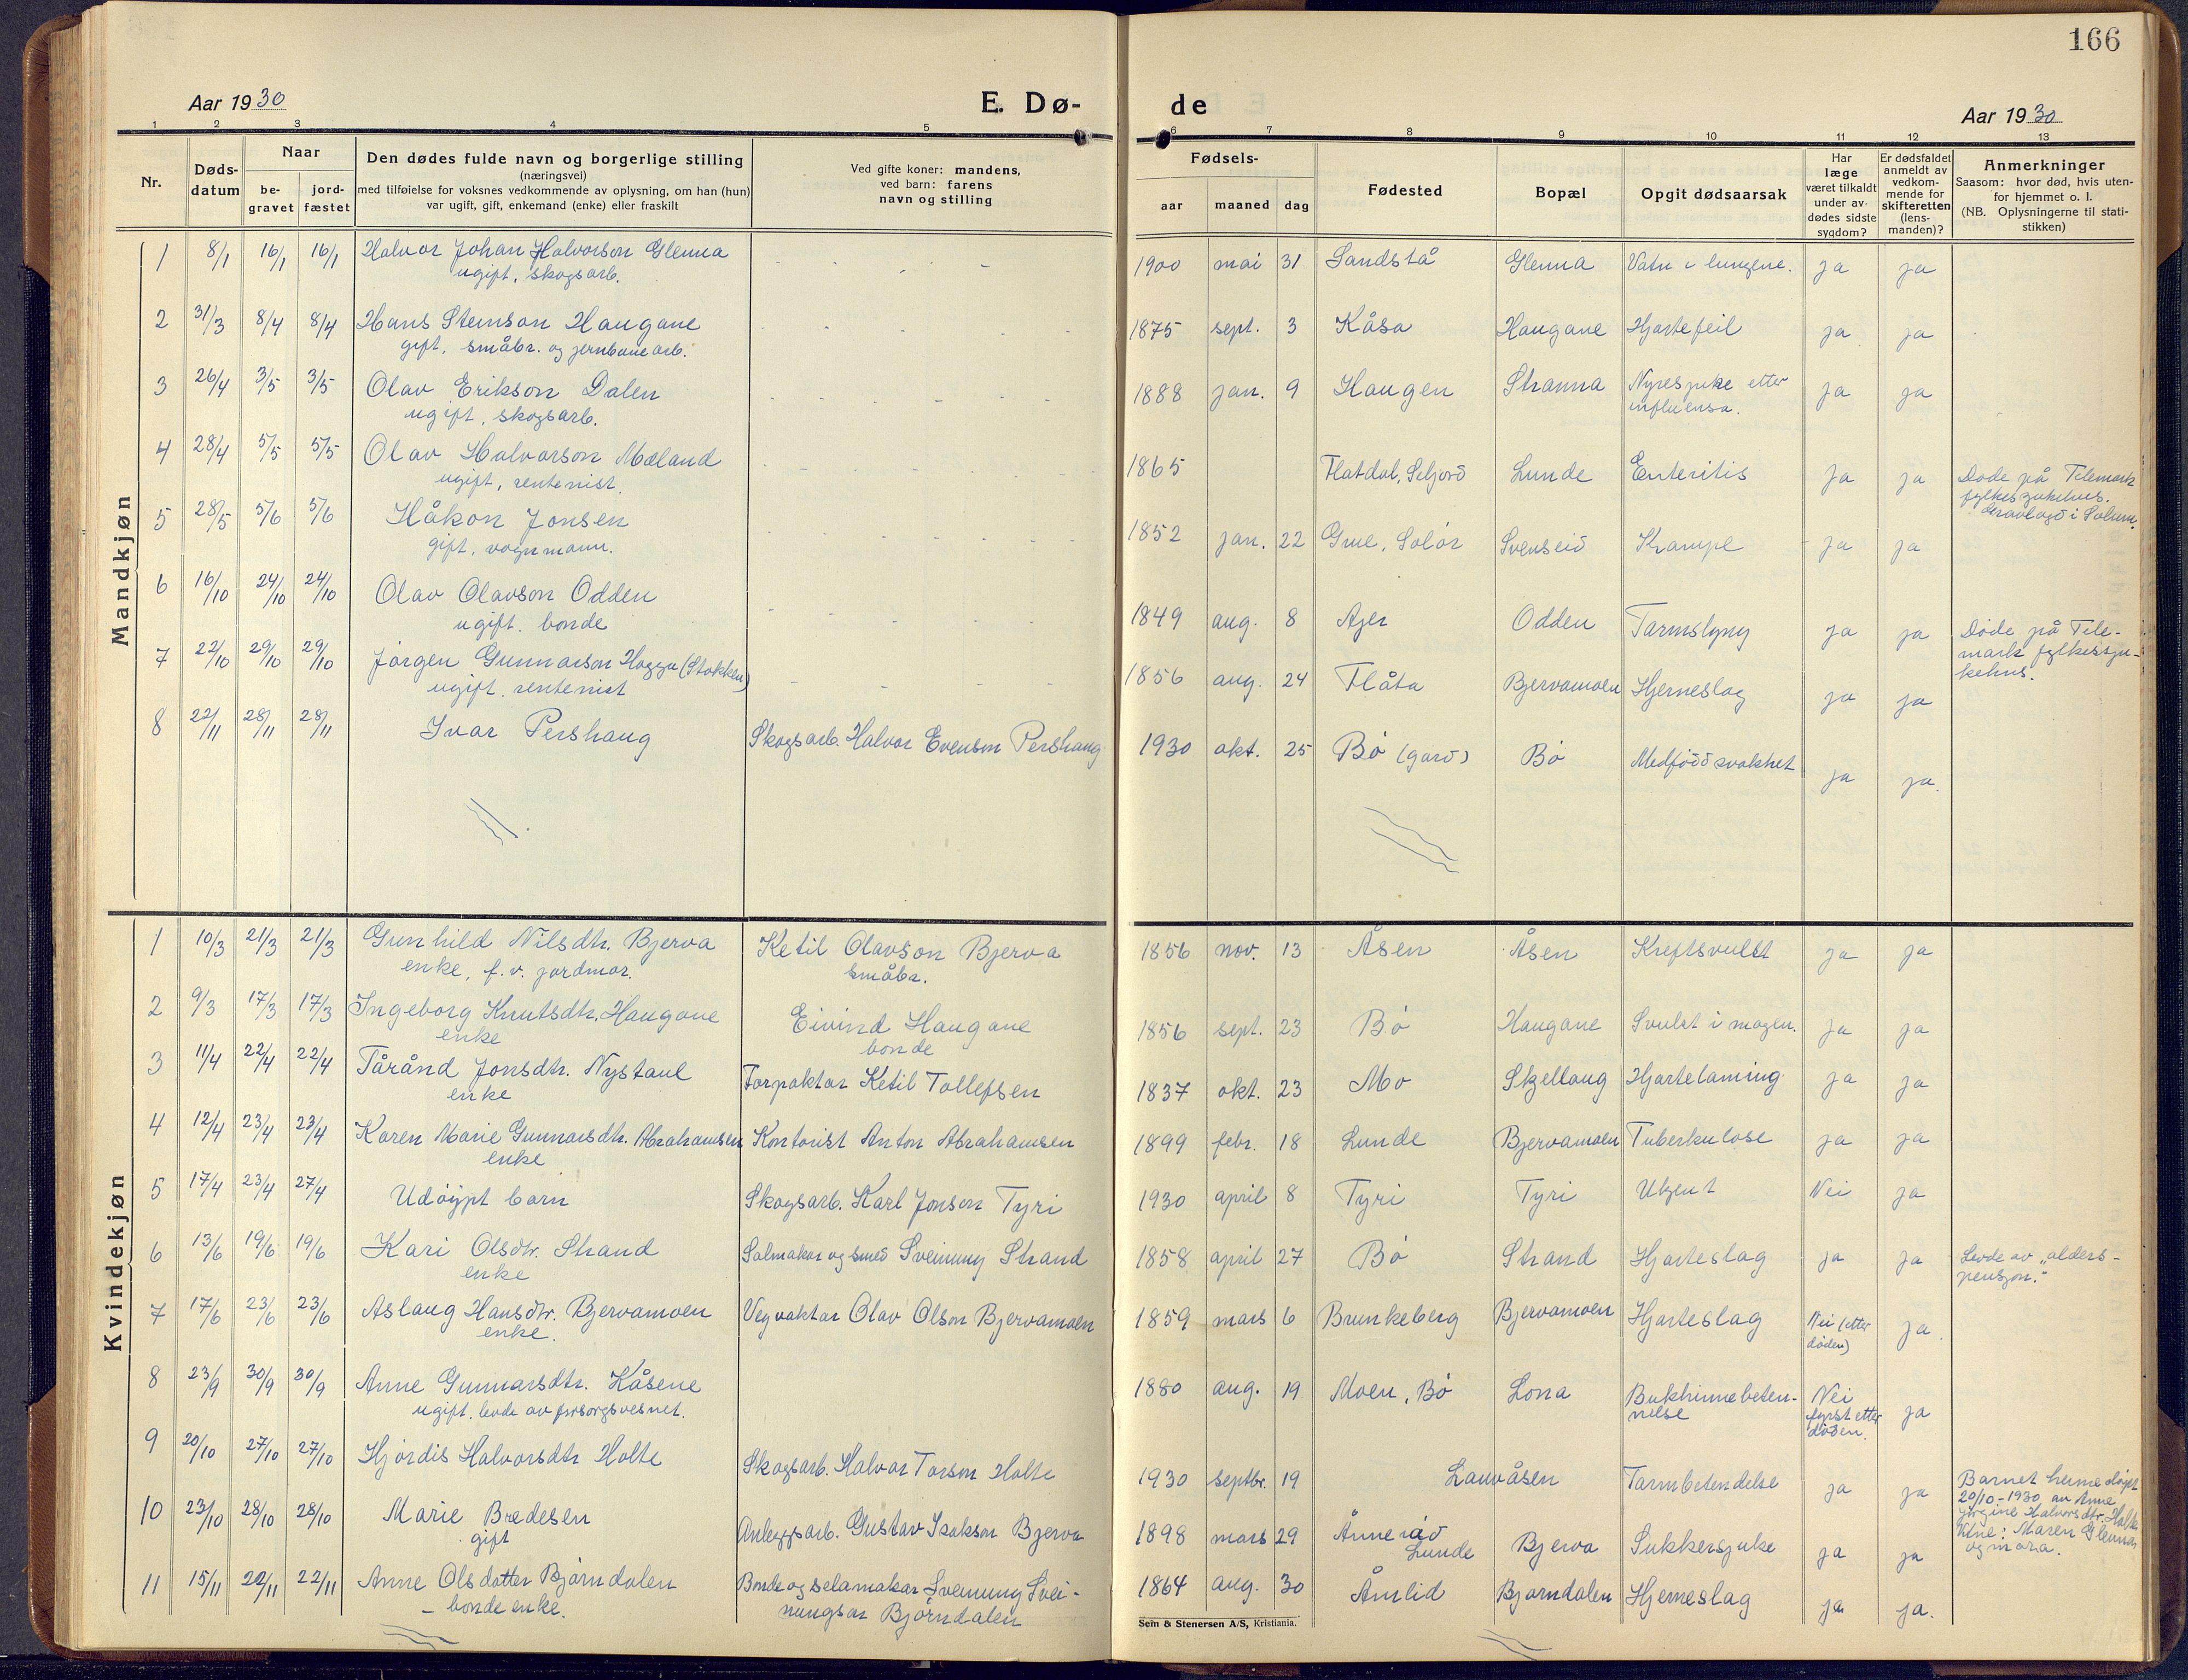 SAKO, Lunde kirkebøker, F/Fa/L0006: Ministerialbok nr. I 6, 1922-1940, s. 166